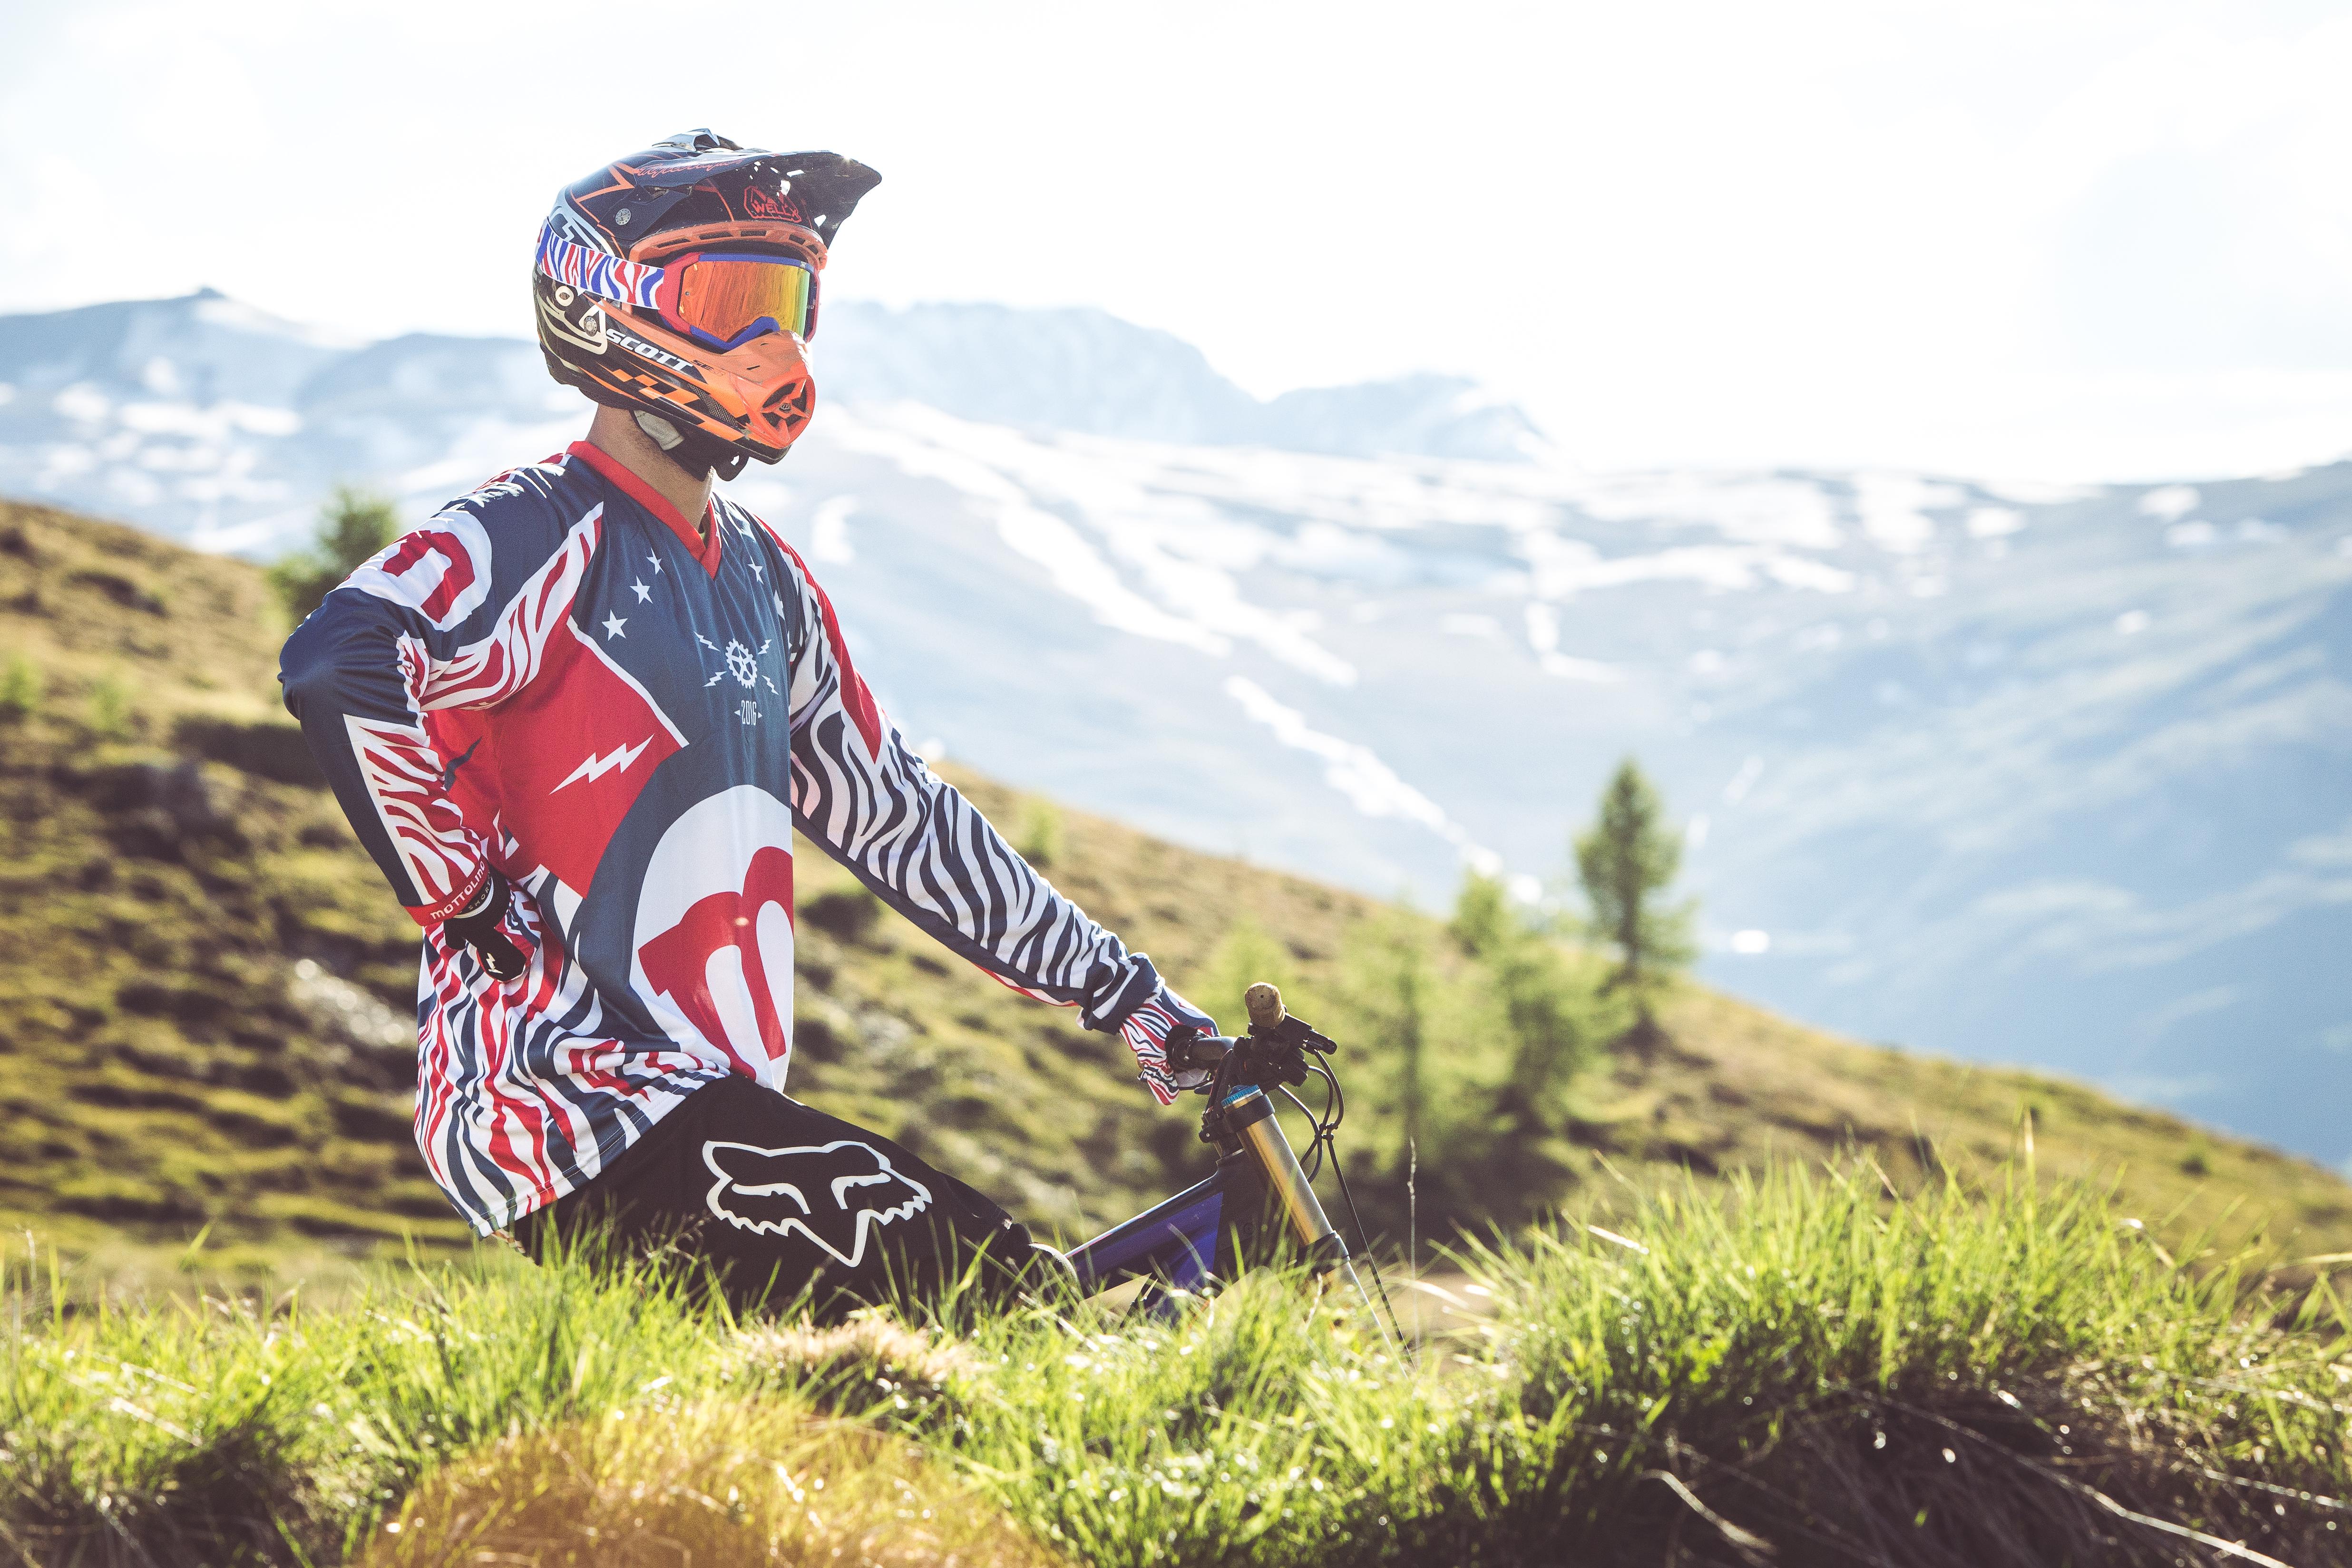 Bikepass unico a Livigno: paradiso epr i rider